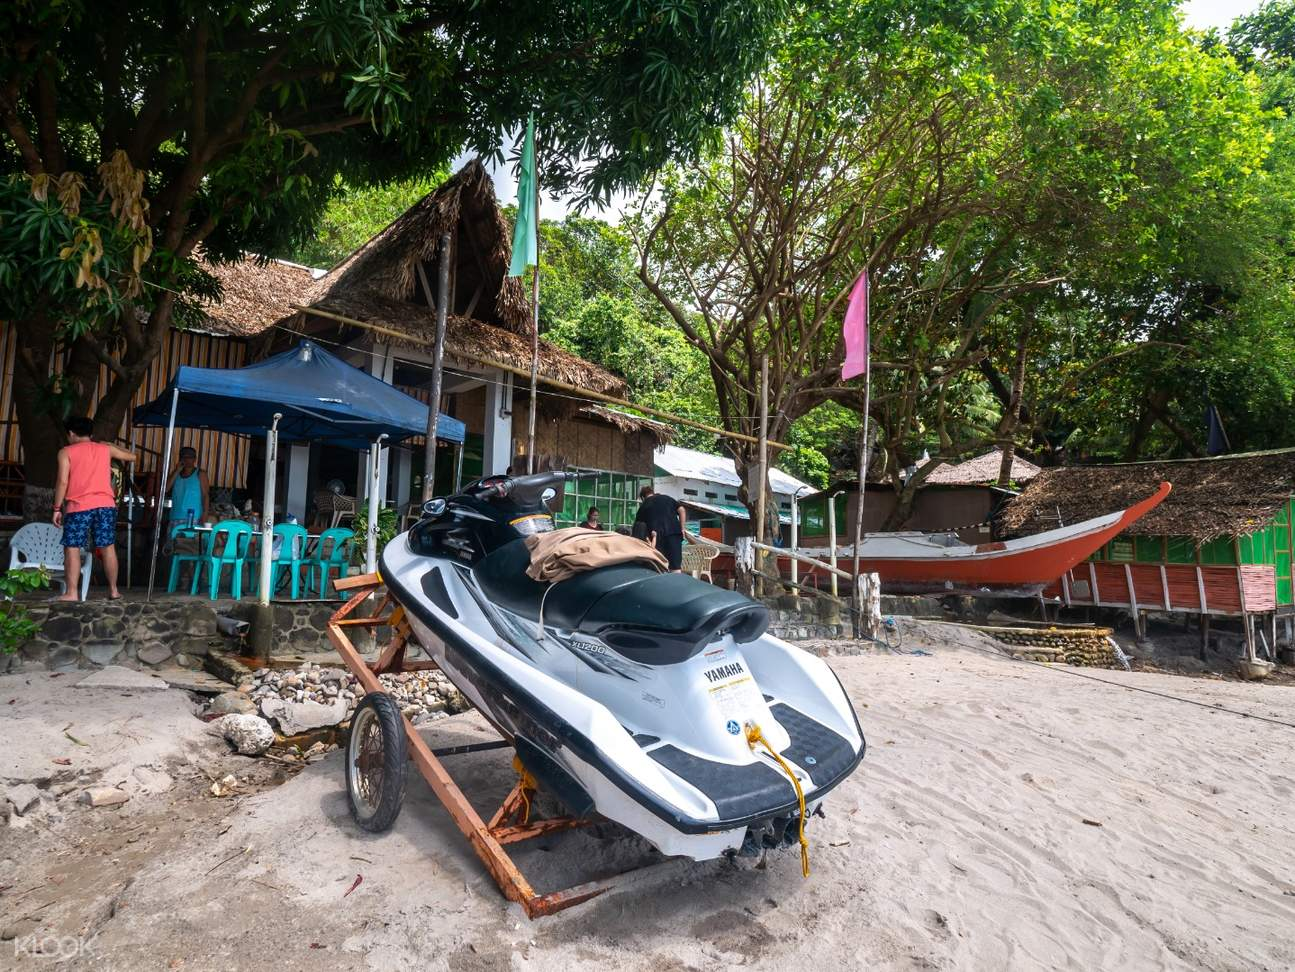 Jet ski parked on the beach